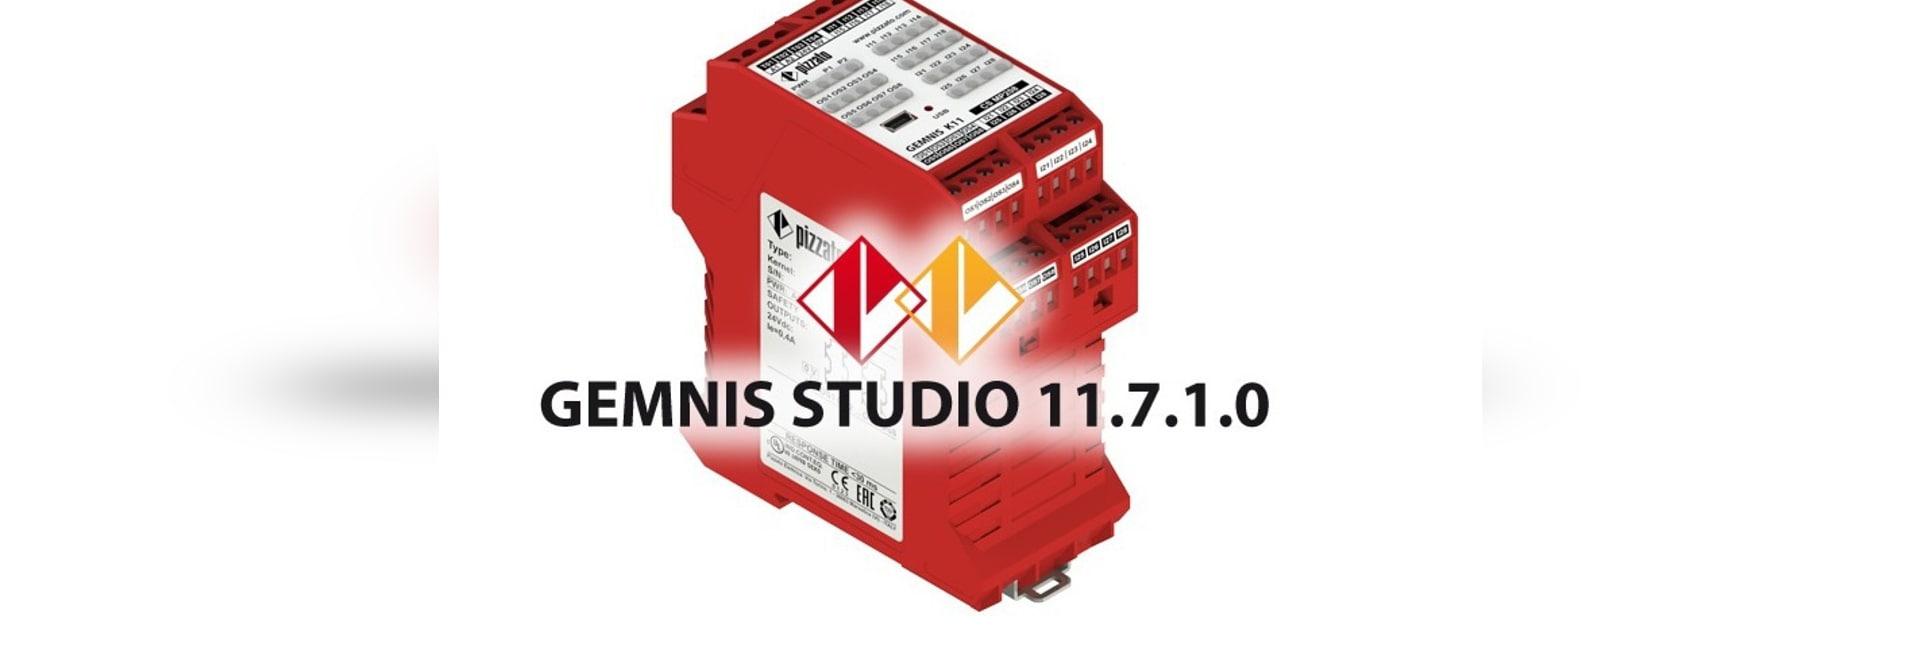 New version of the Gemnis Studio software 11.7